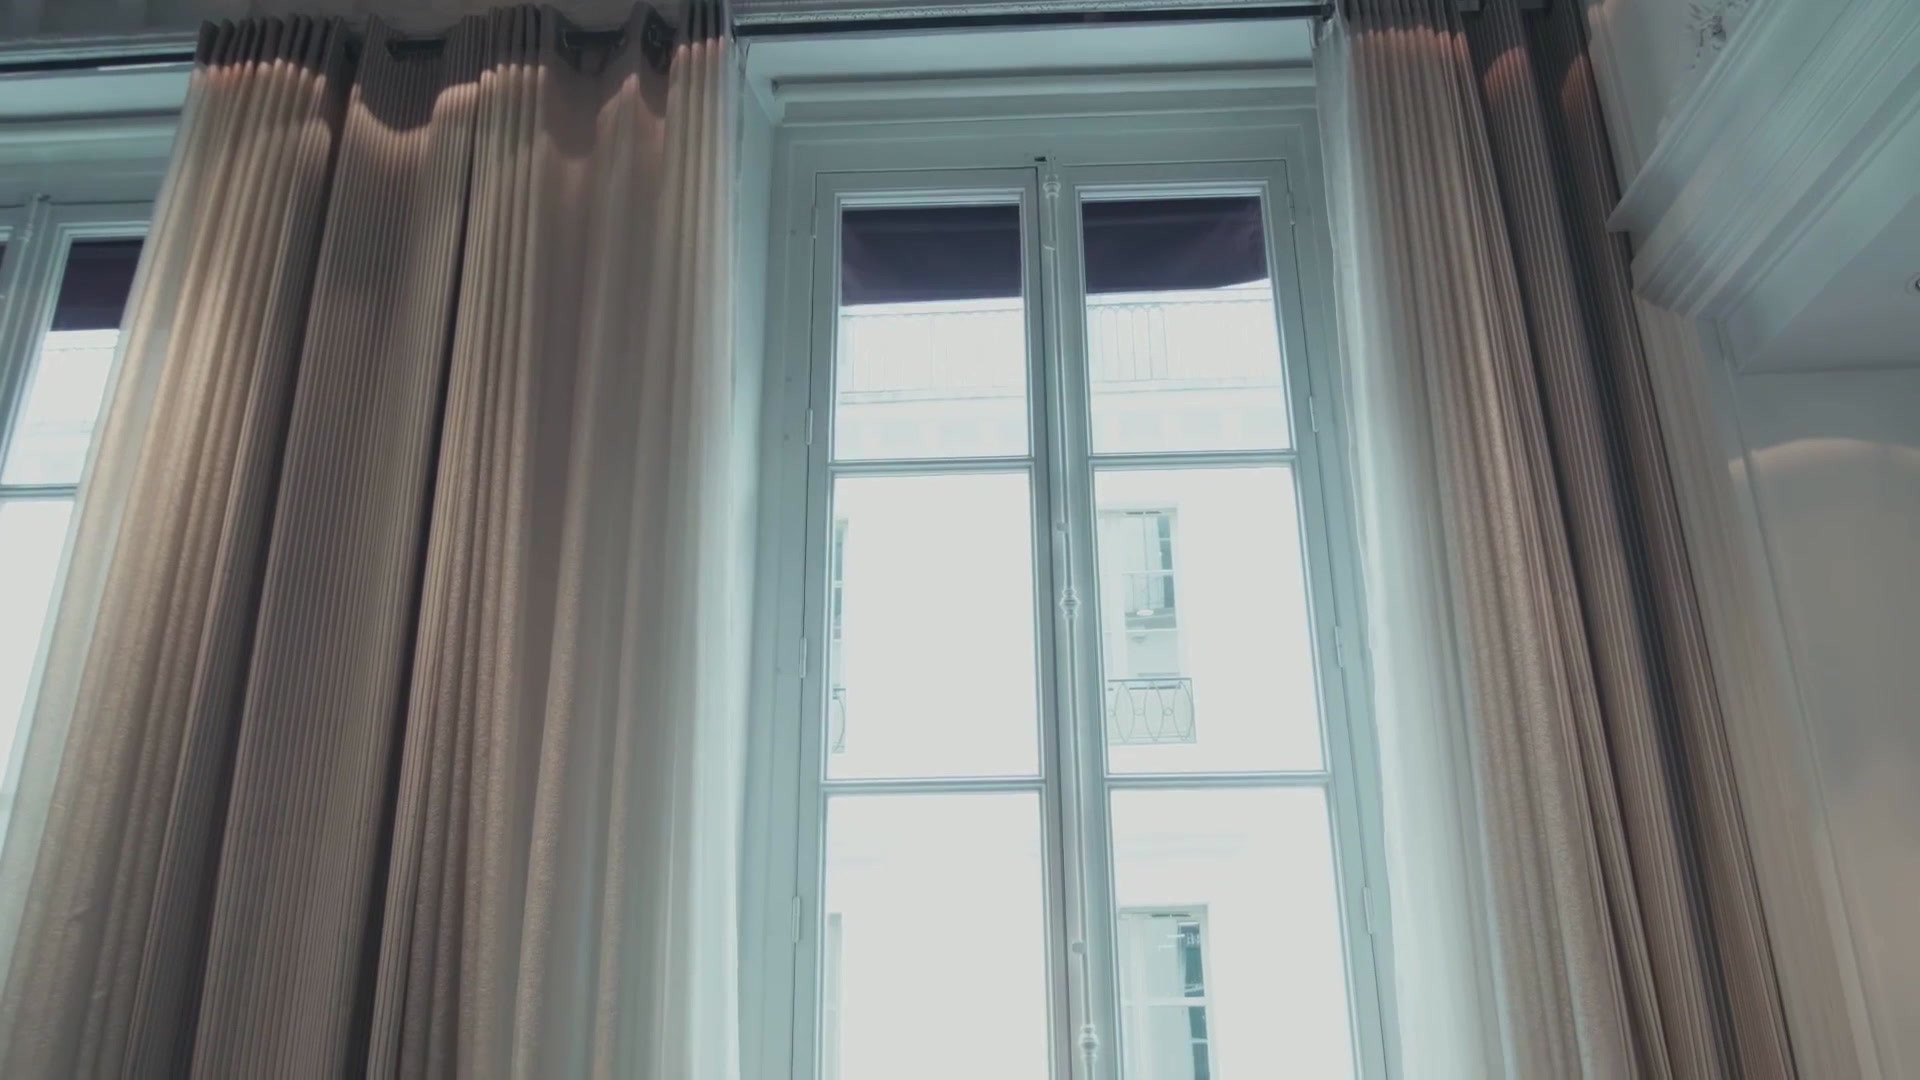 Salon Rennes 170321.mp4